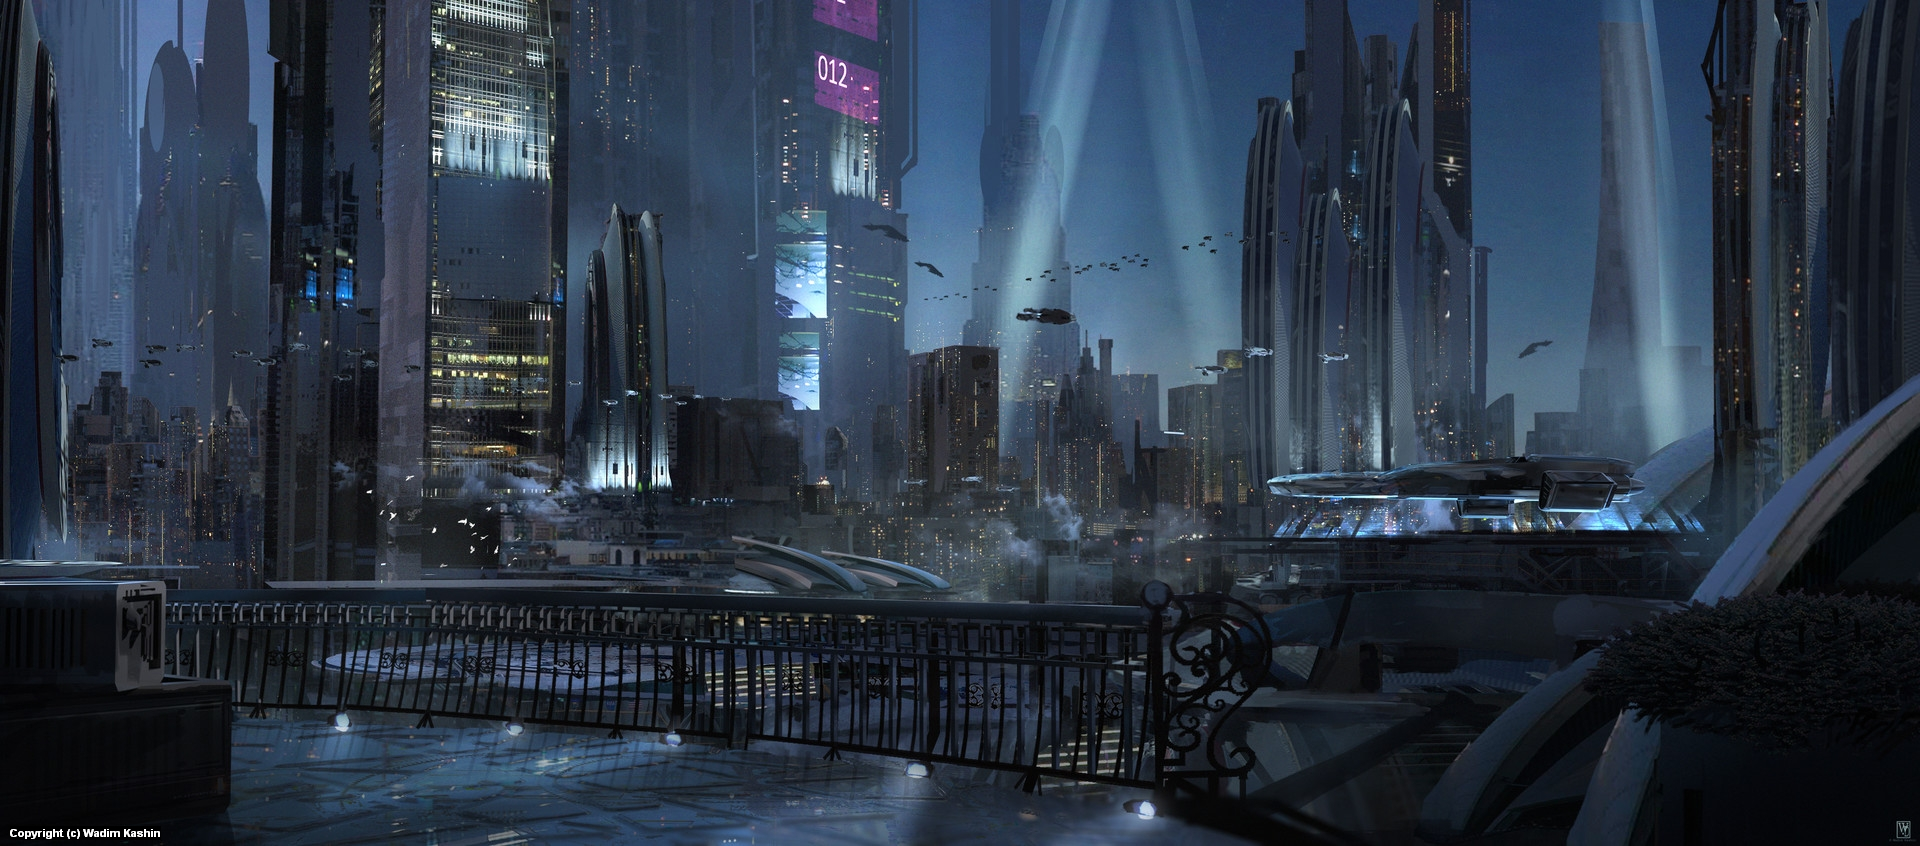 Night Lights Artwork by Wadim Kashin